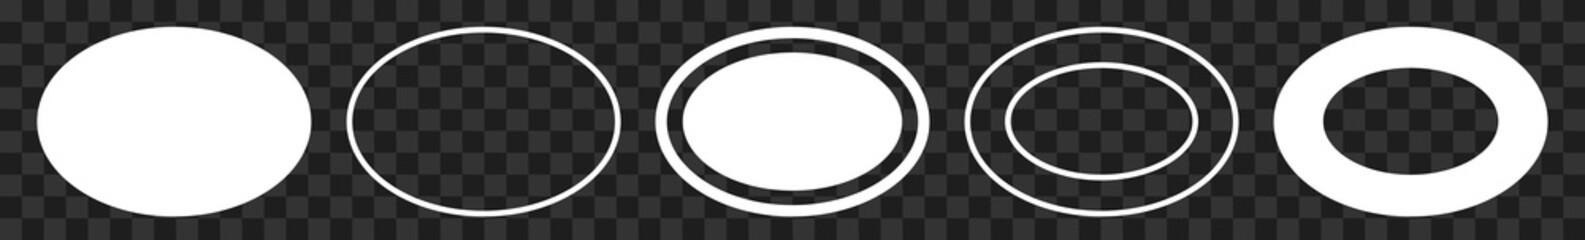 Label Oval White | Logo Sticker | Emblem | Icon | Variations